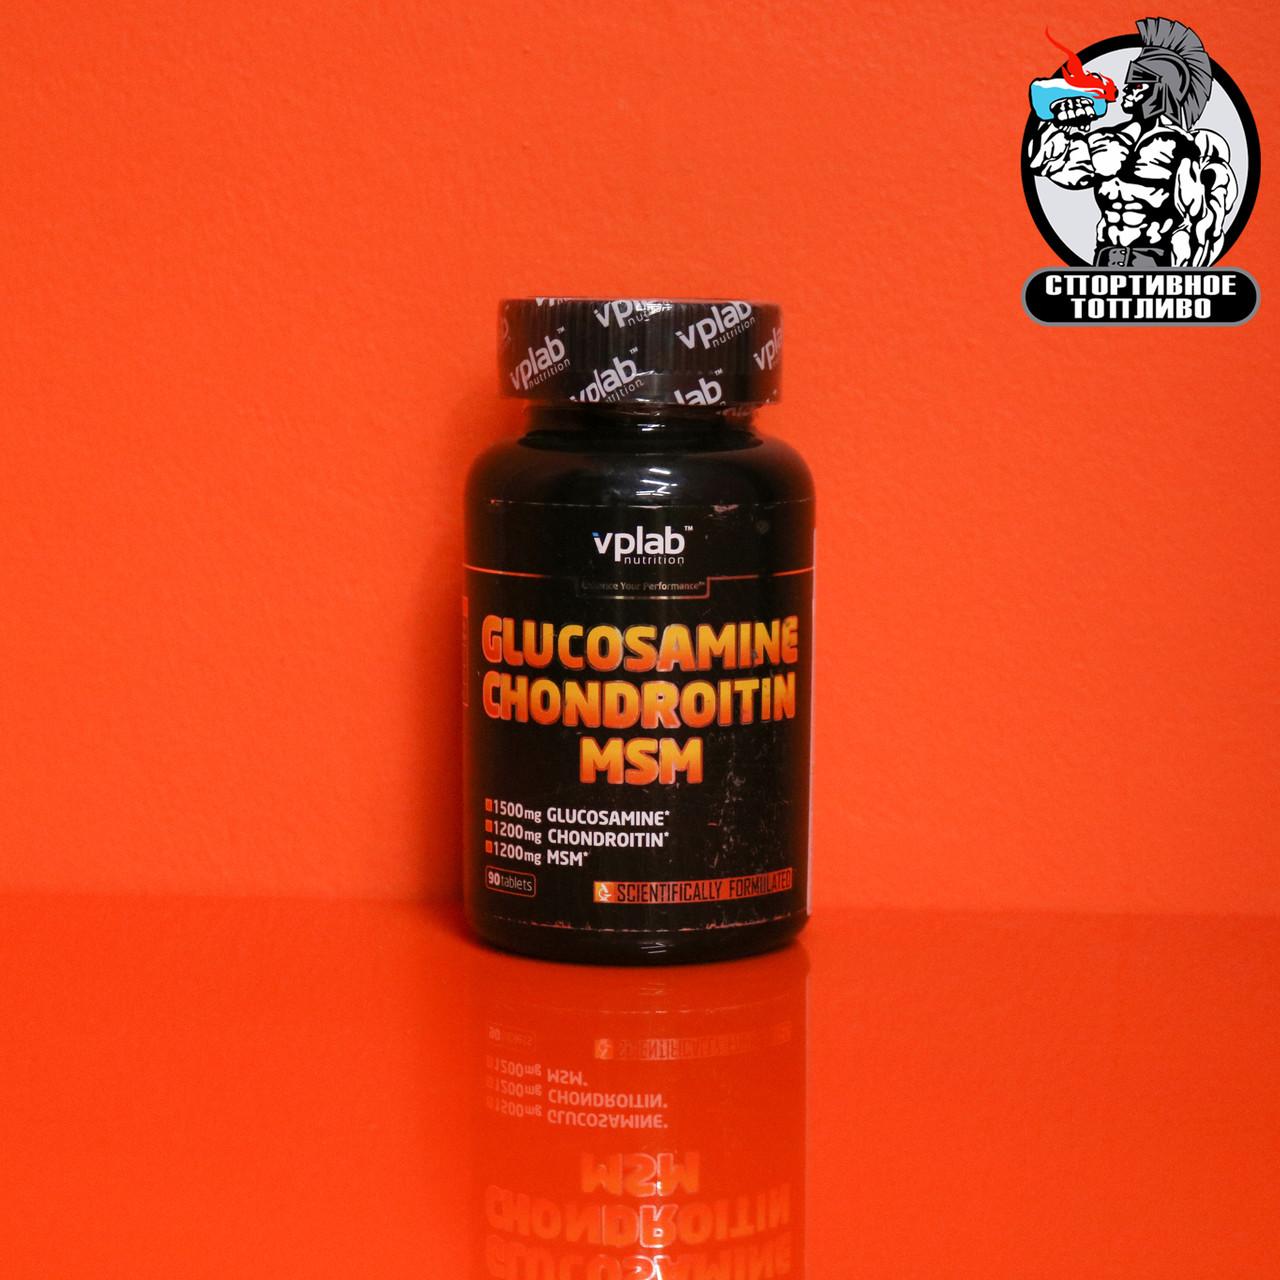 VPLab - Glucosamine, Chonndroitin, MSM 180табл/30 порций